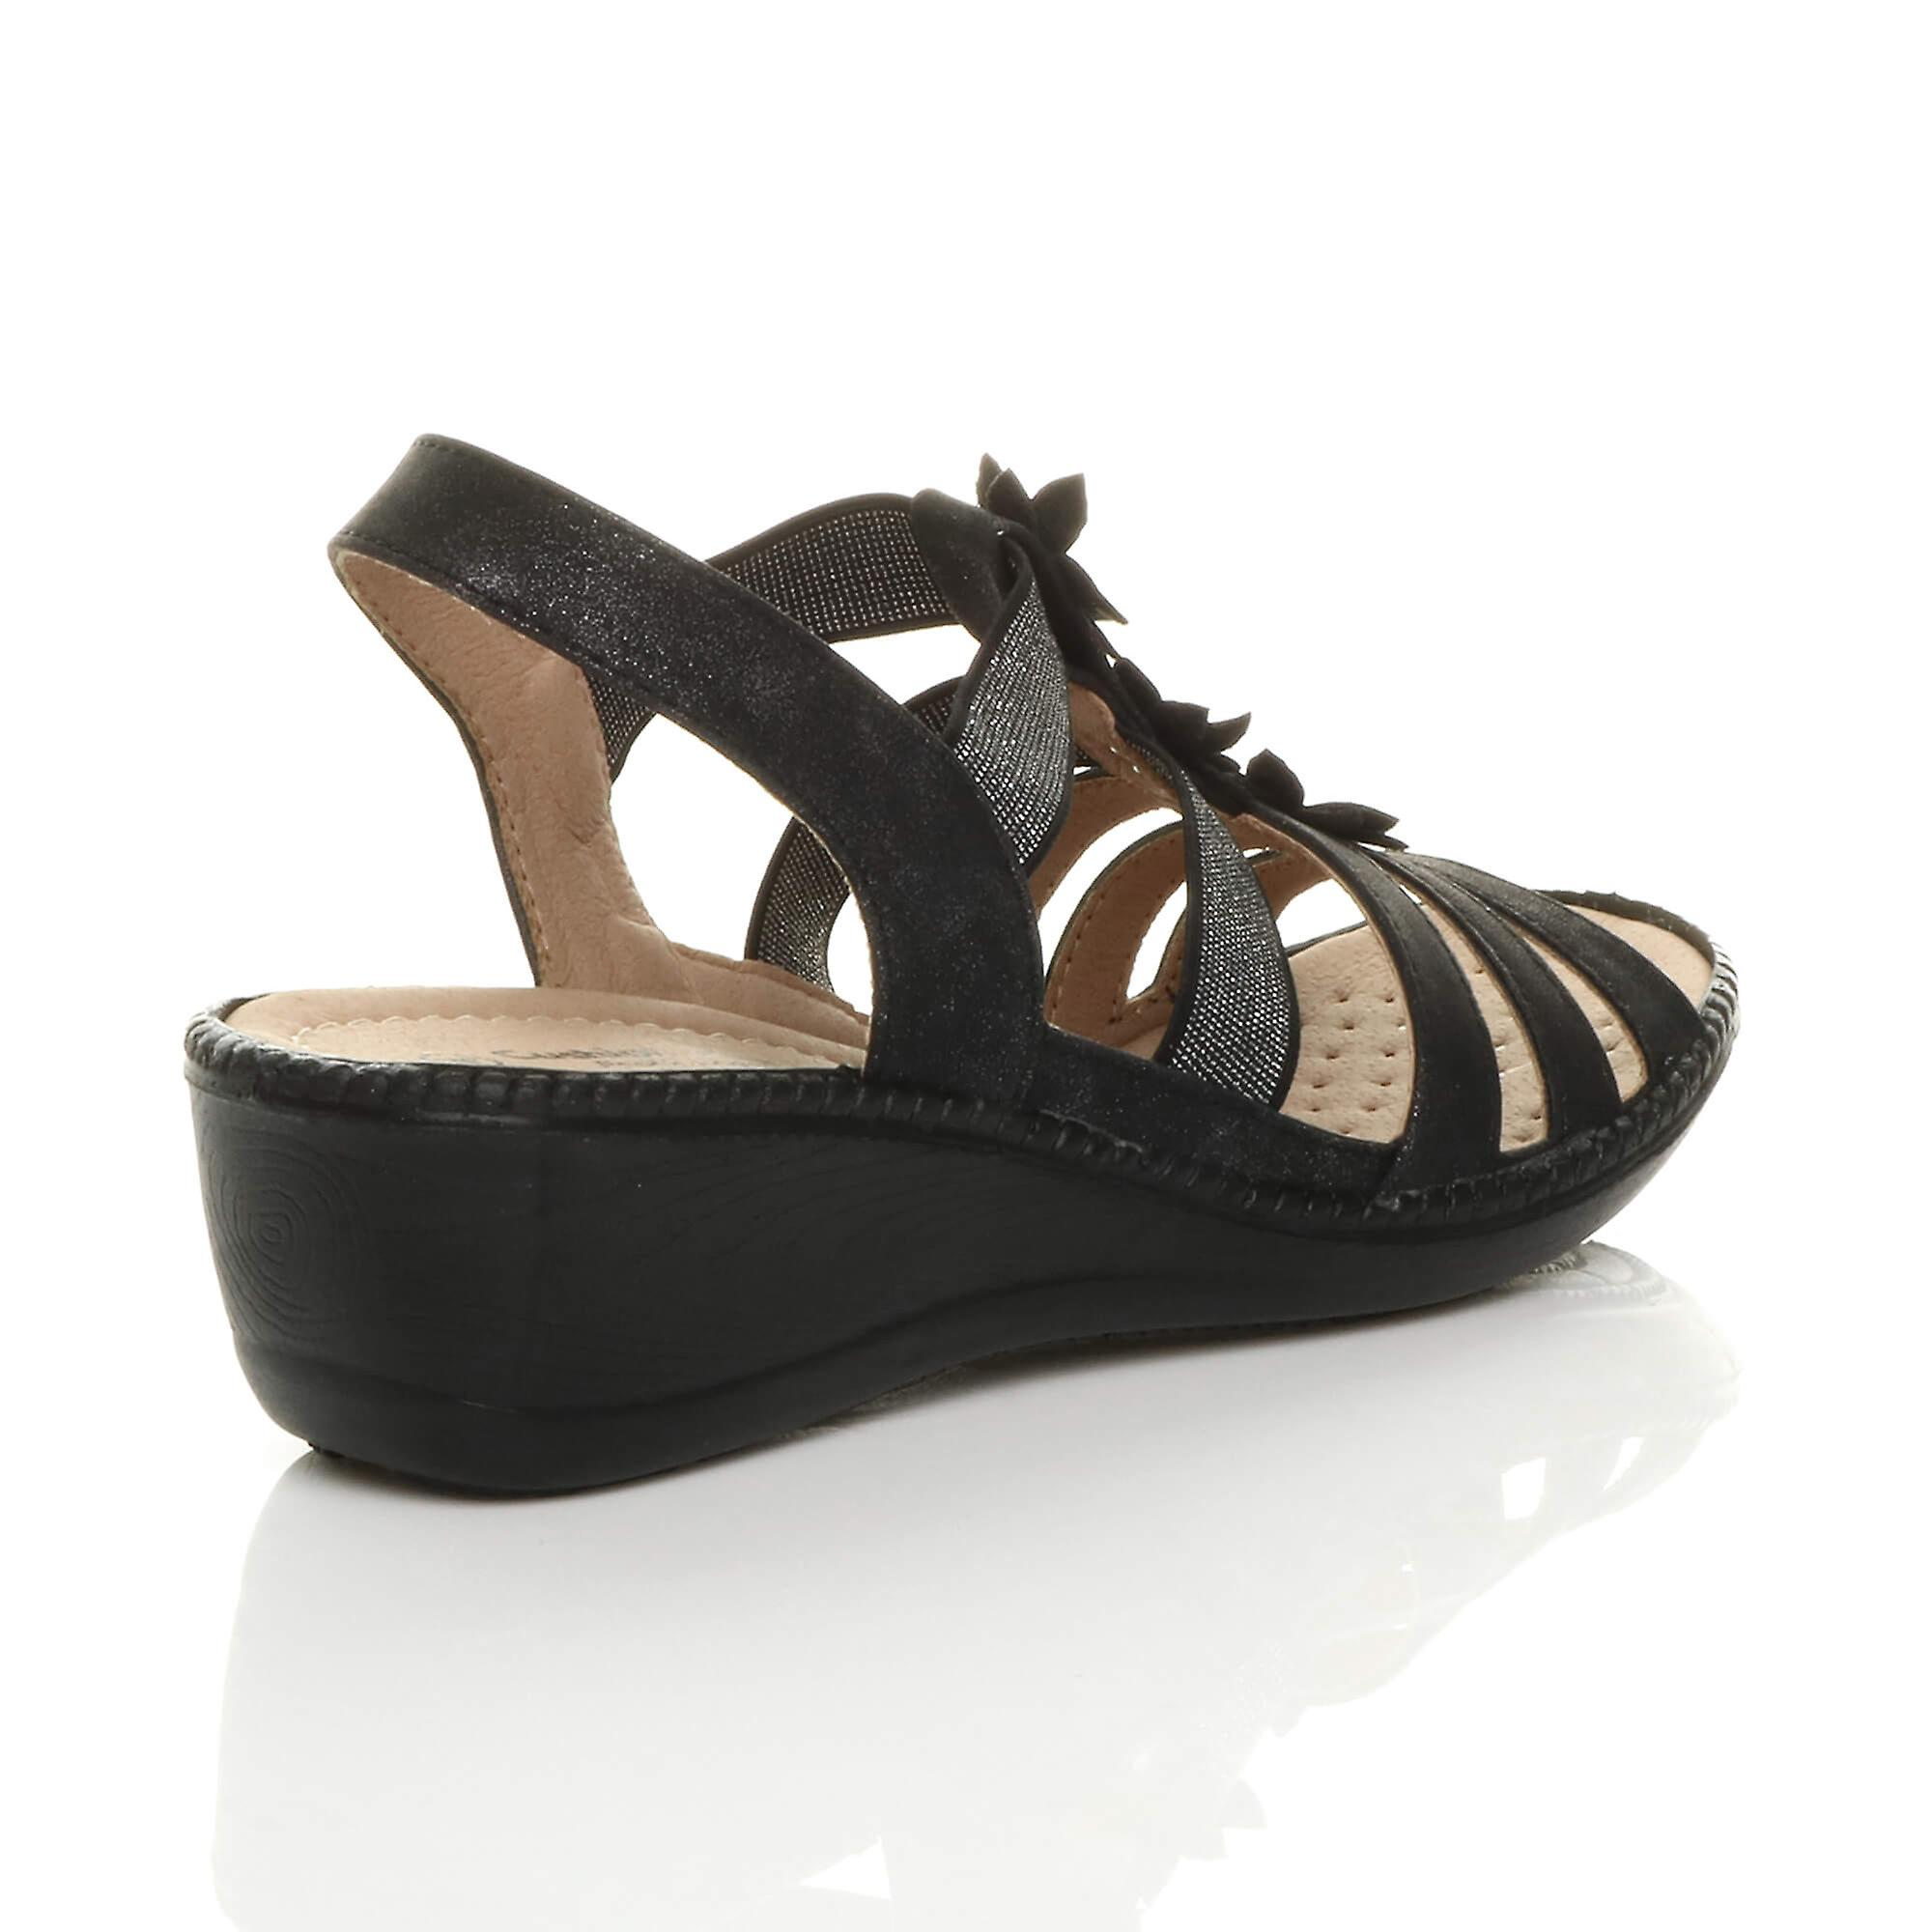 Ajvani womens low mid wedge heel t-bar gladiator slingback comfort sandals